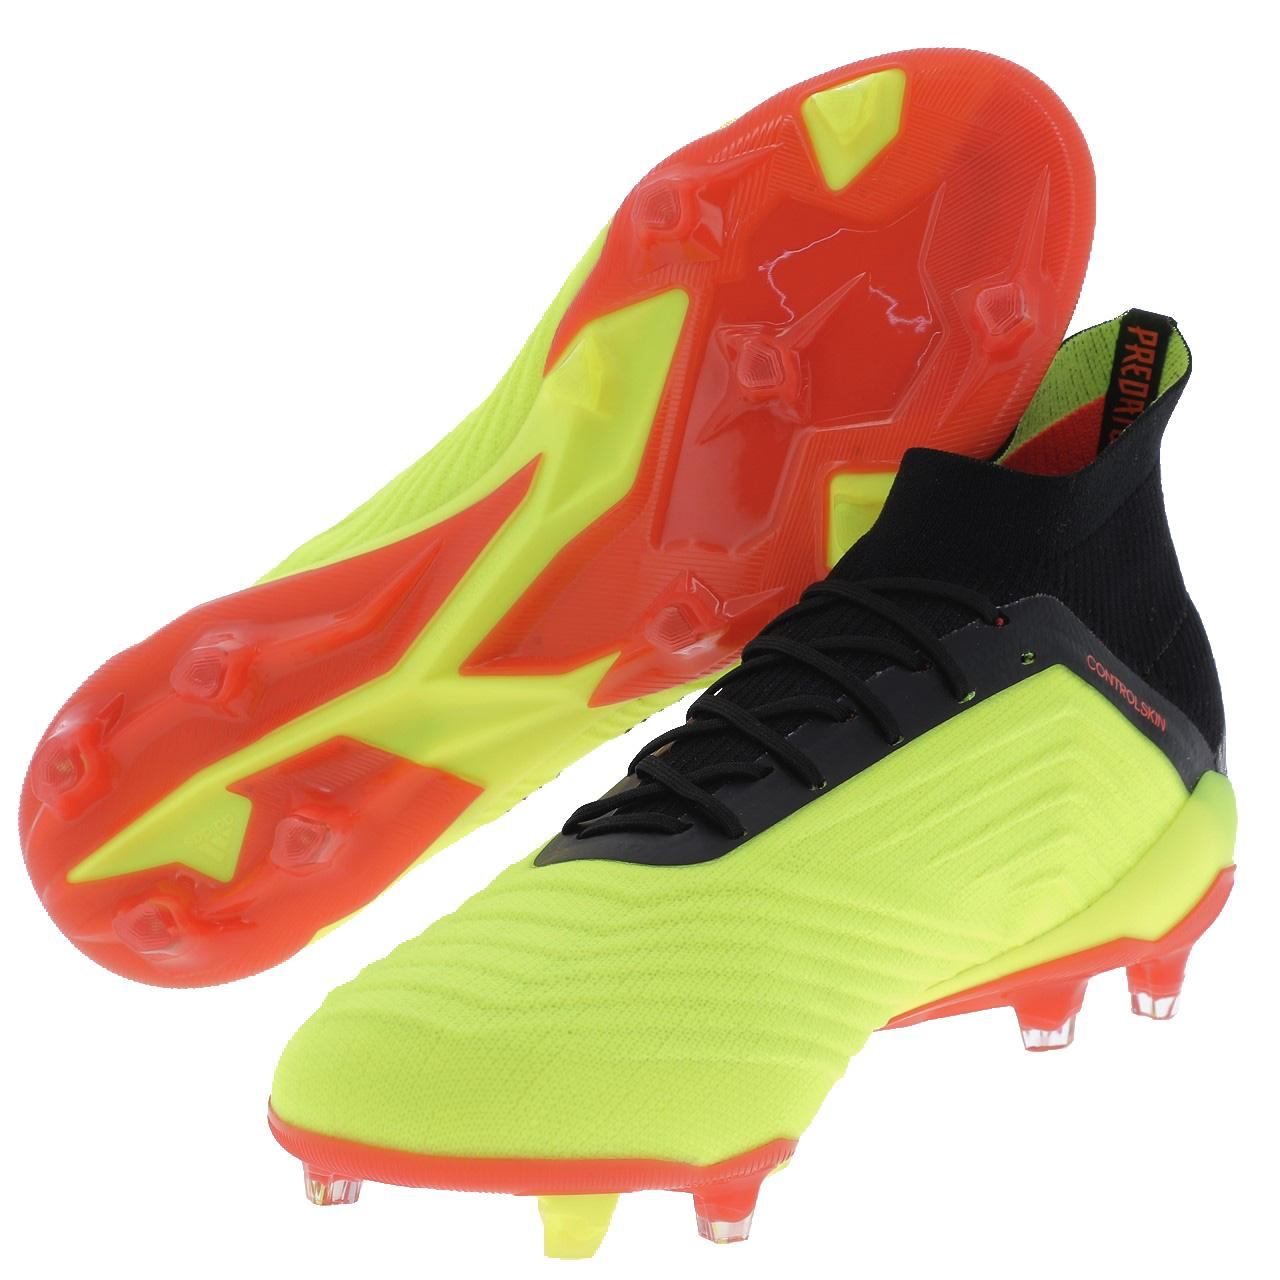 Football-Shoes-Flap-Adidas-Predator-18-1-Fg-Syello-Yellow-47849-New thumbnail 5